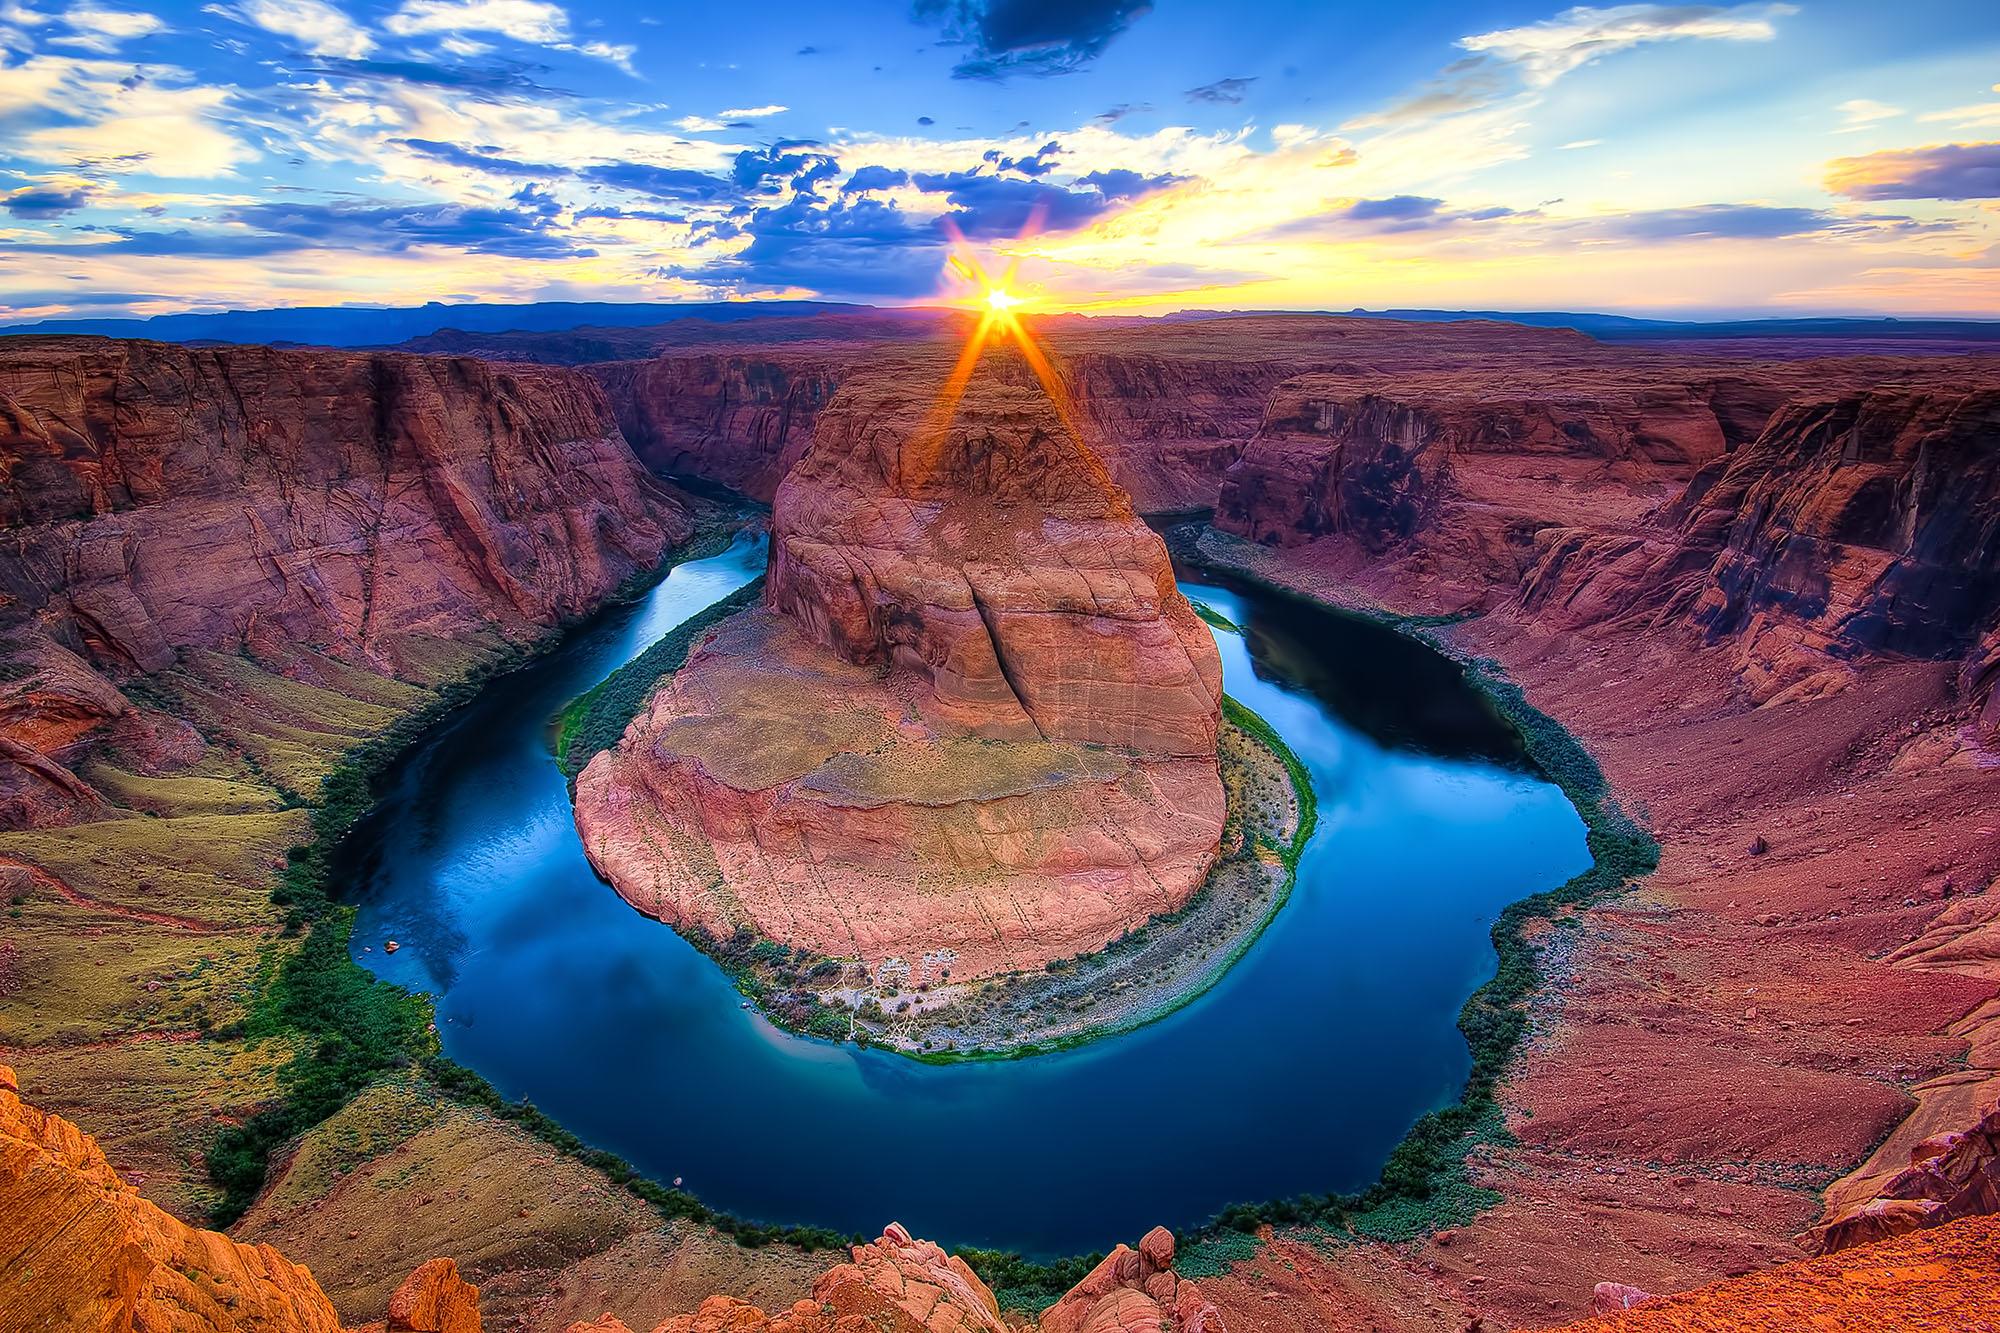 Horseshoe Bend, The Grand Canyon, Arizona